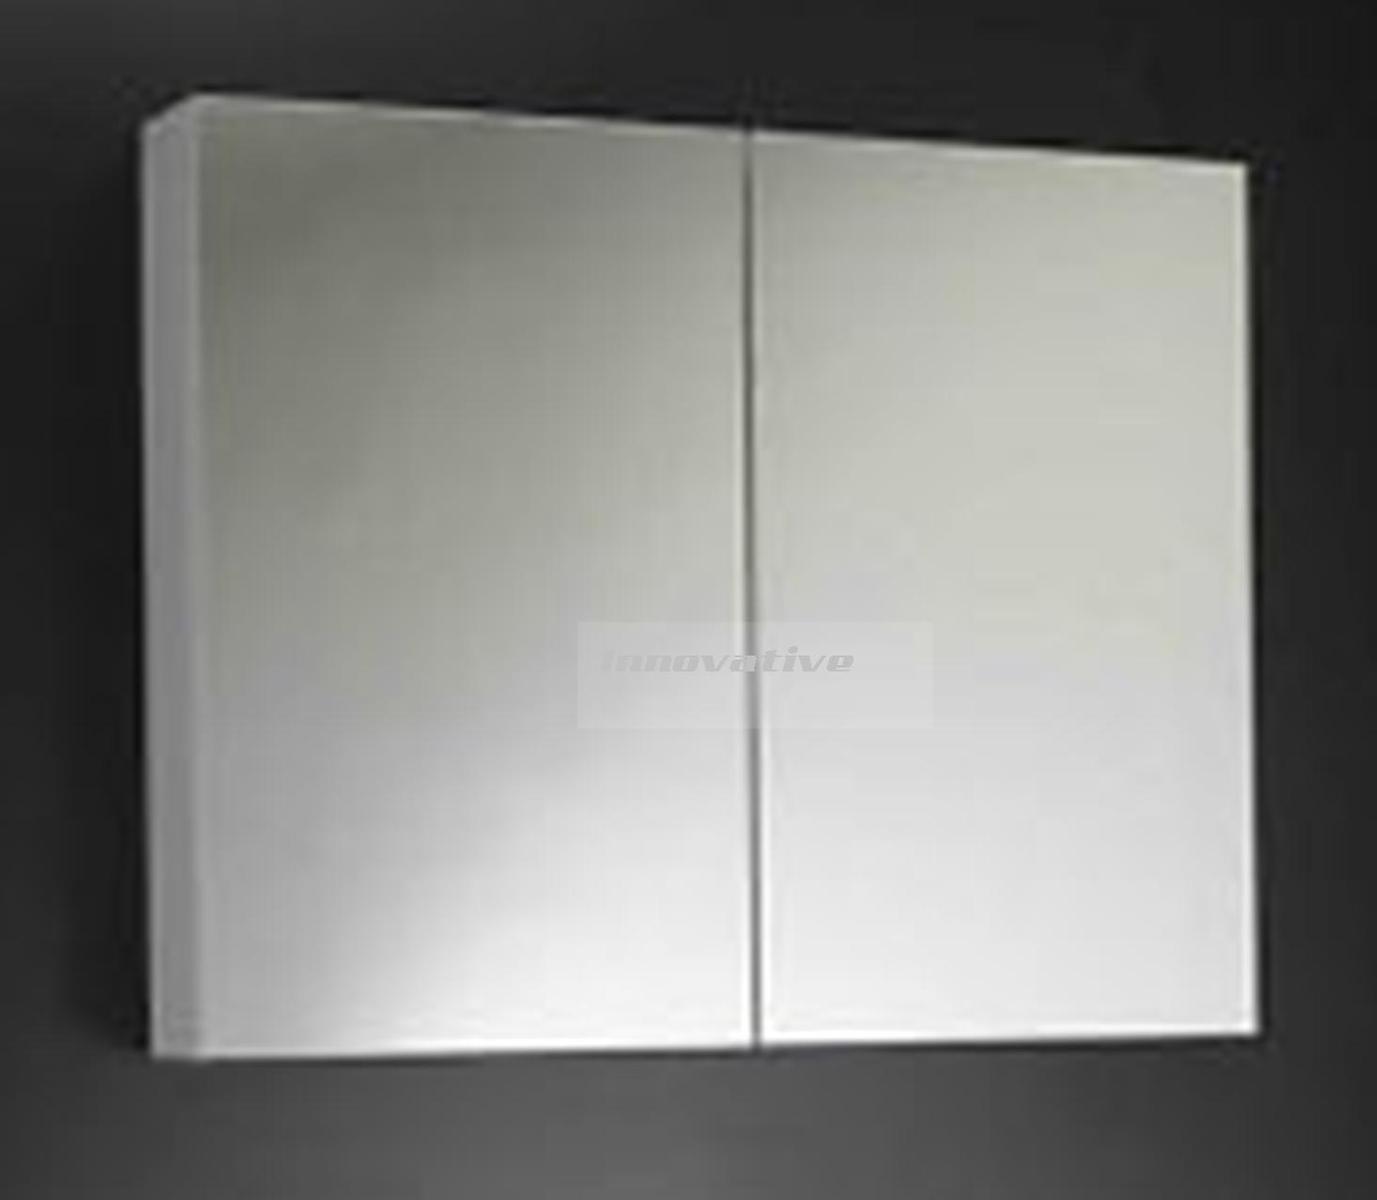 mirror cabinet medicine shaving bathroom 450wx550hx150d new wall hung